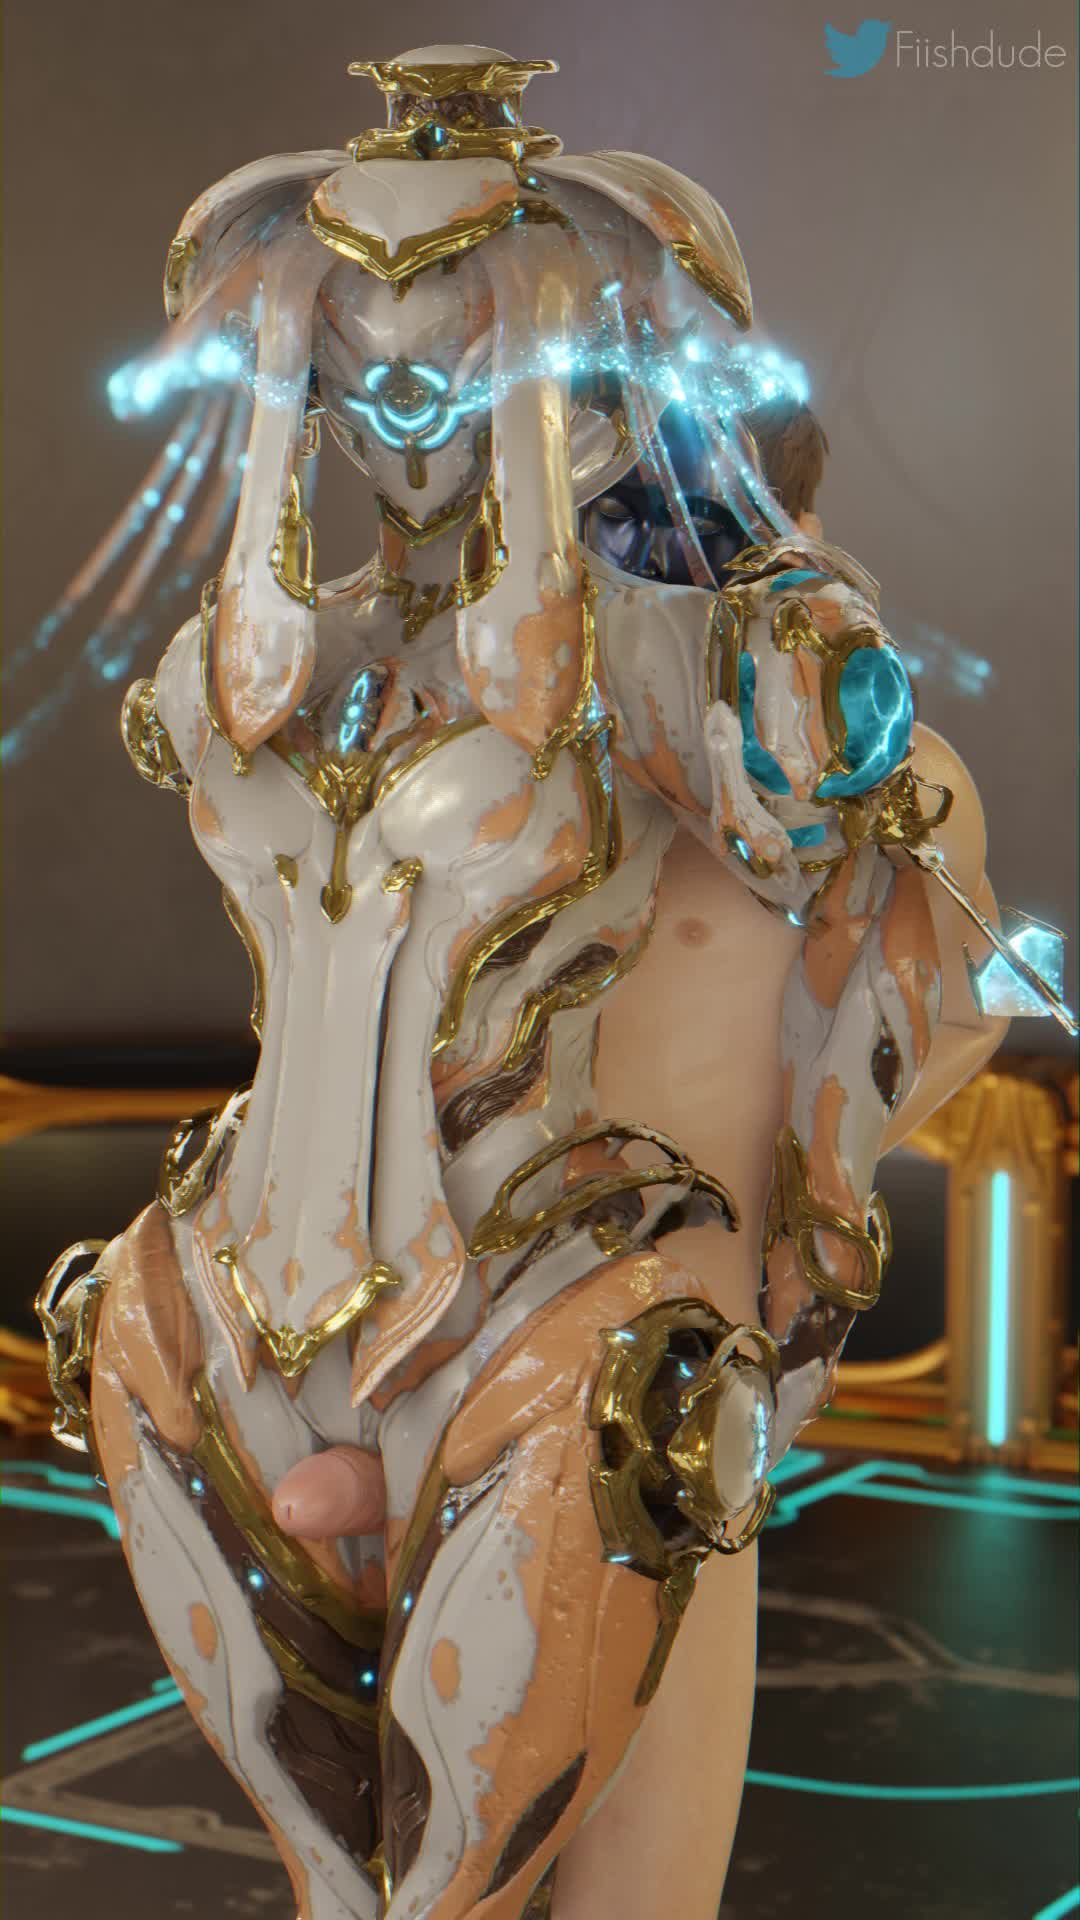 [Ivara Prime] Hips and Thighs (fiishdude)